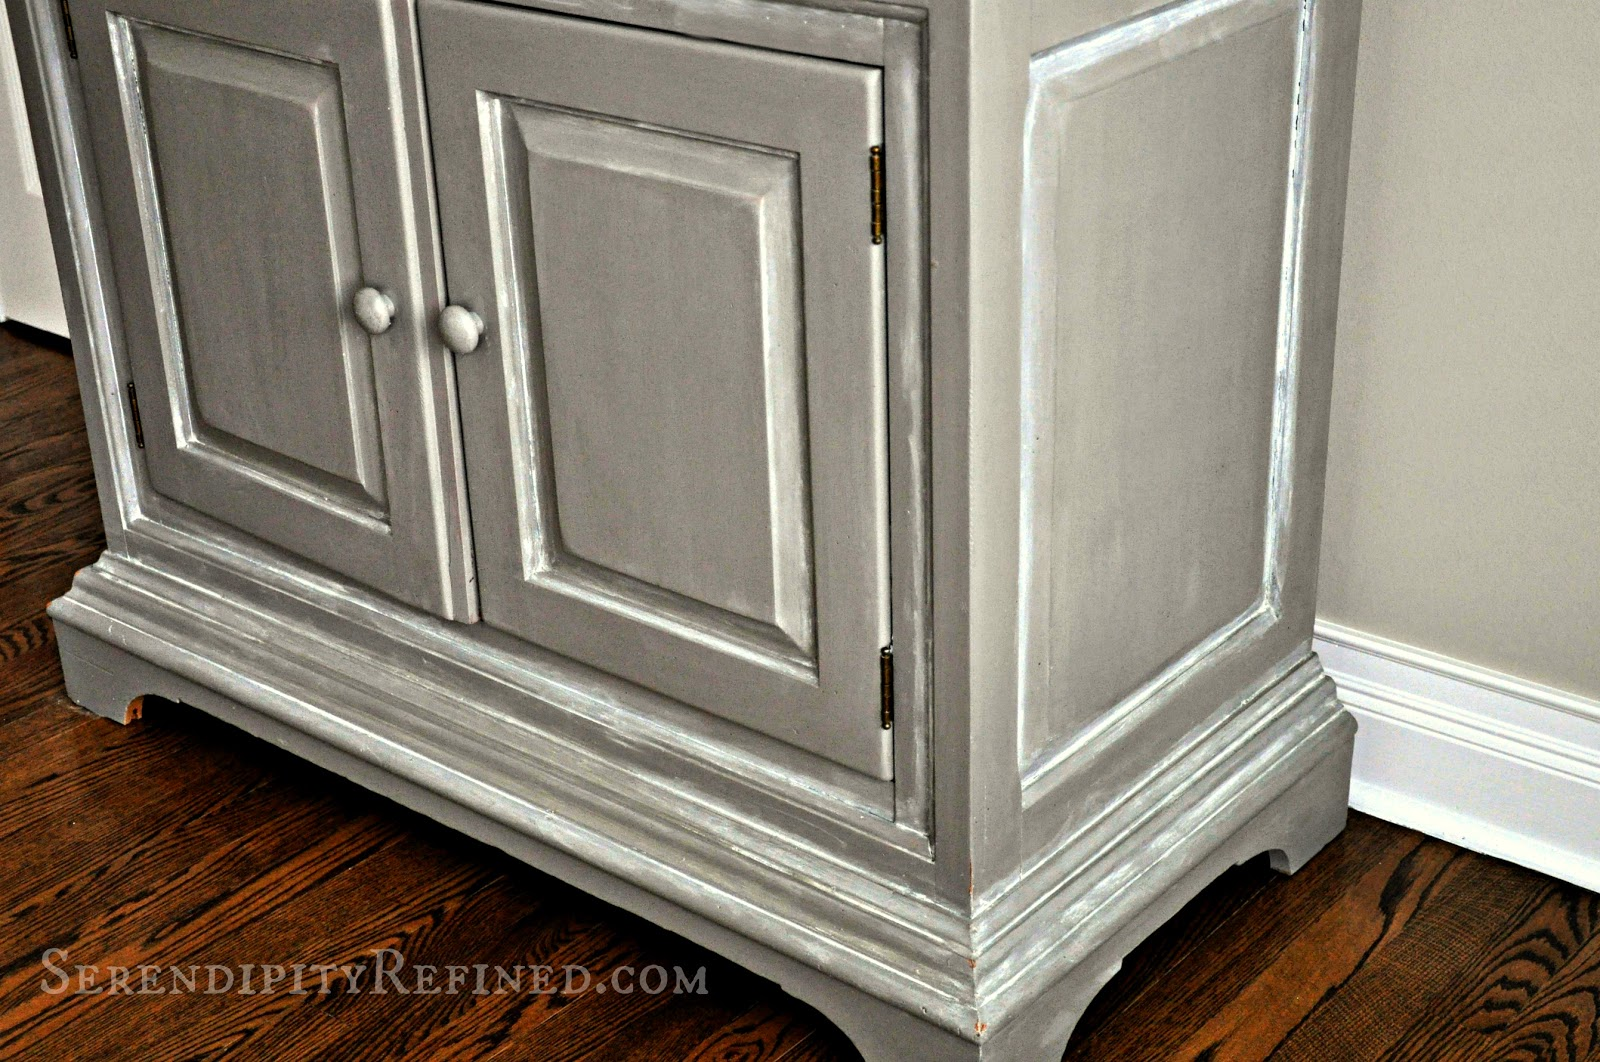 antique white chalk paintSerendipity Refined Blog Reader Painted Furniture DIY Help 2